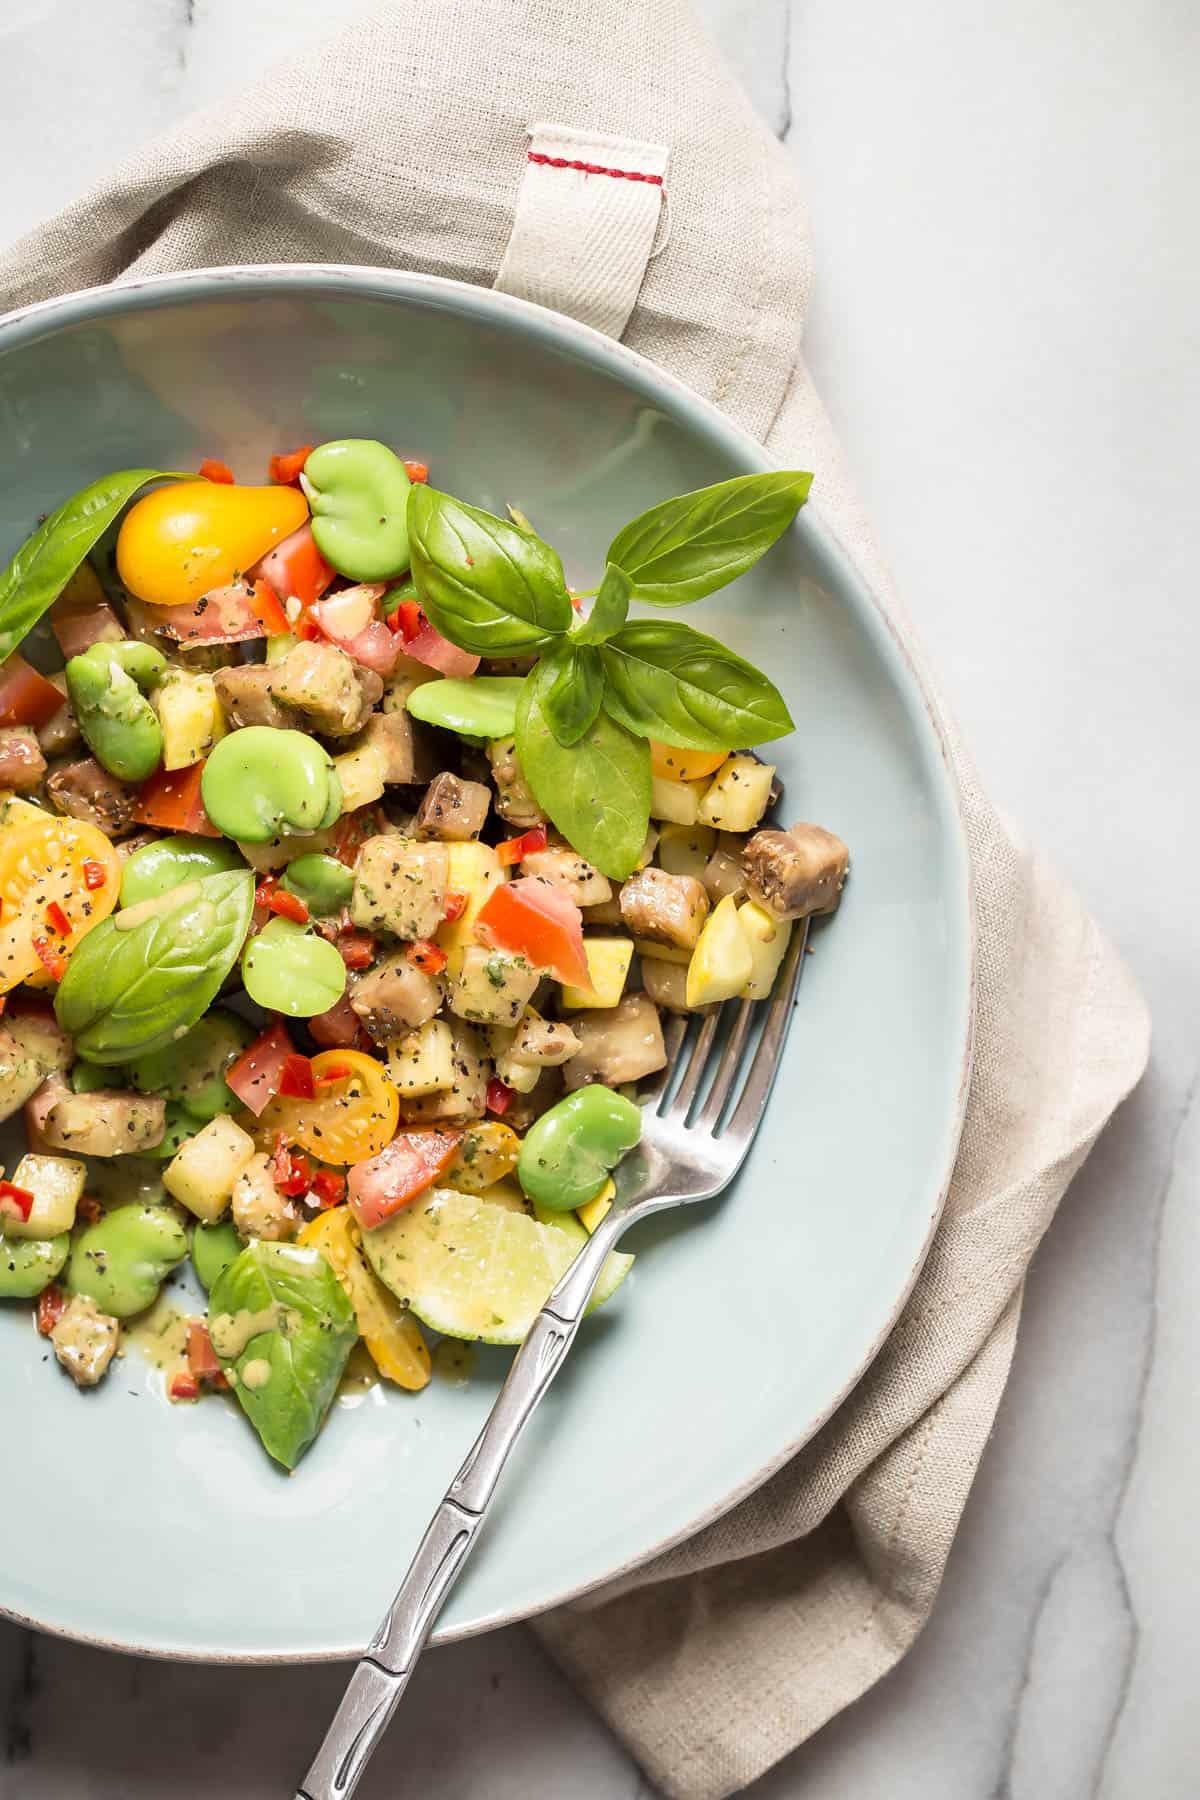 Sockeye Salmon and Fava Bean Salad